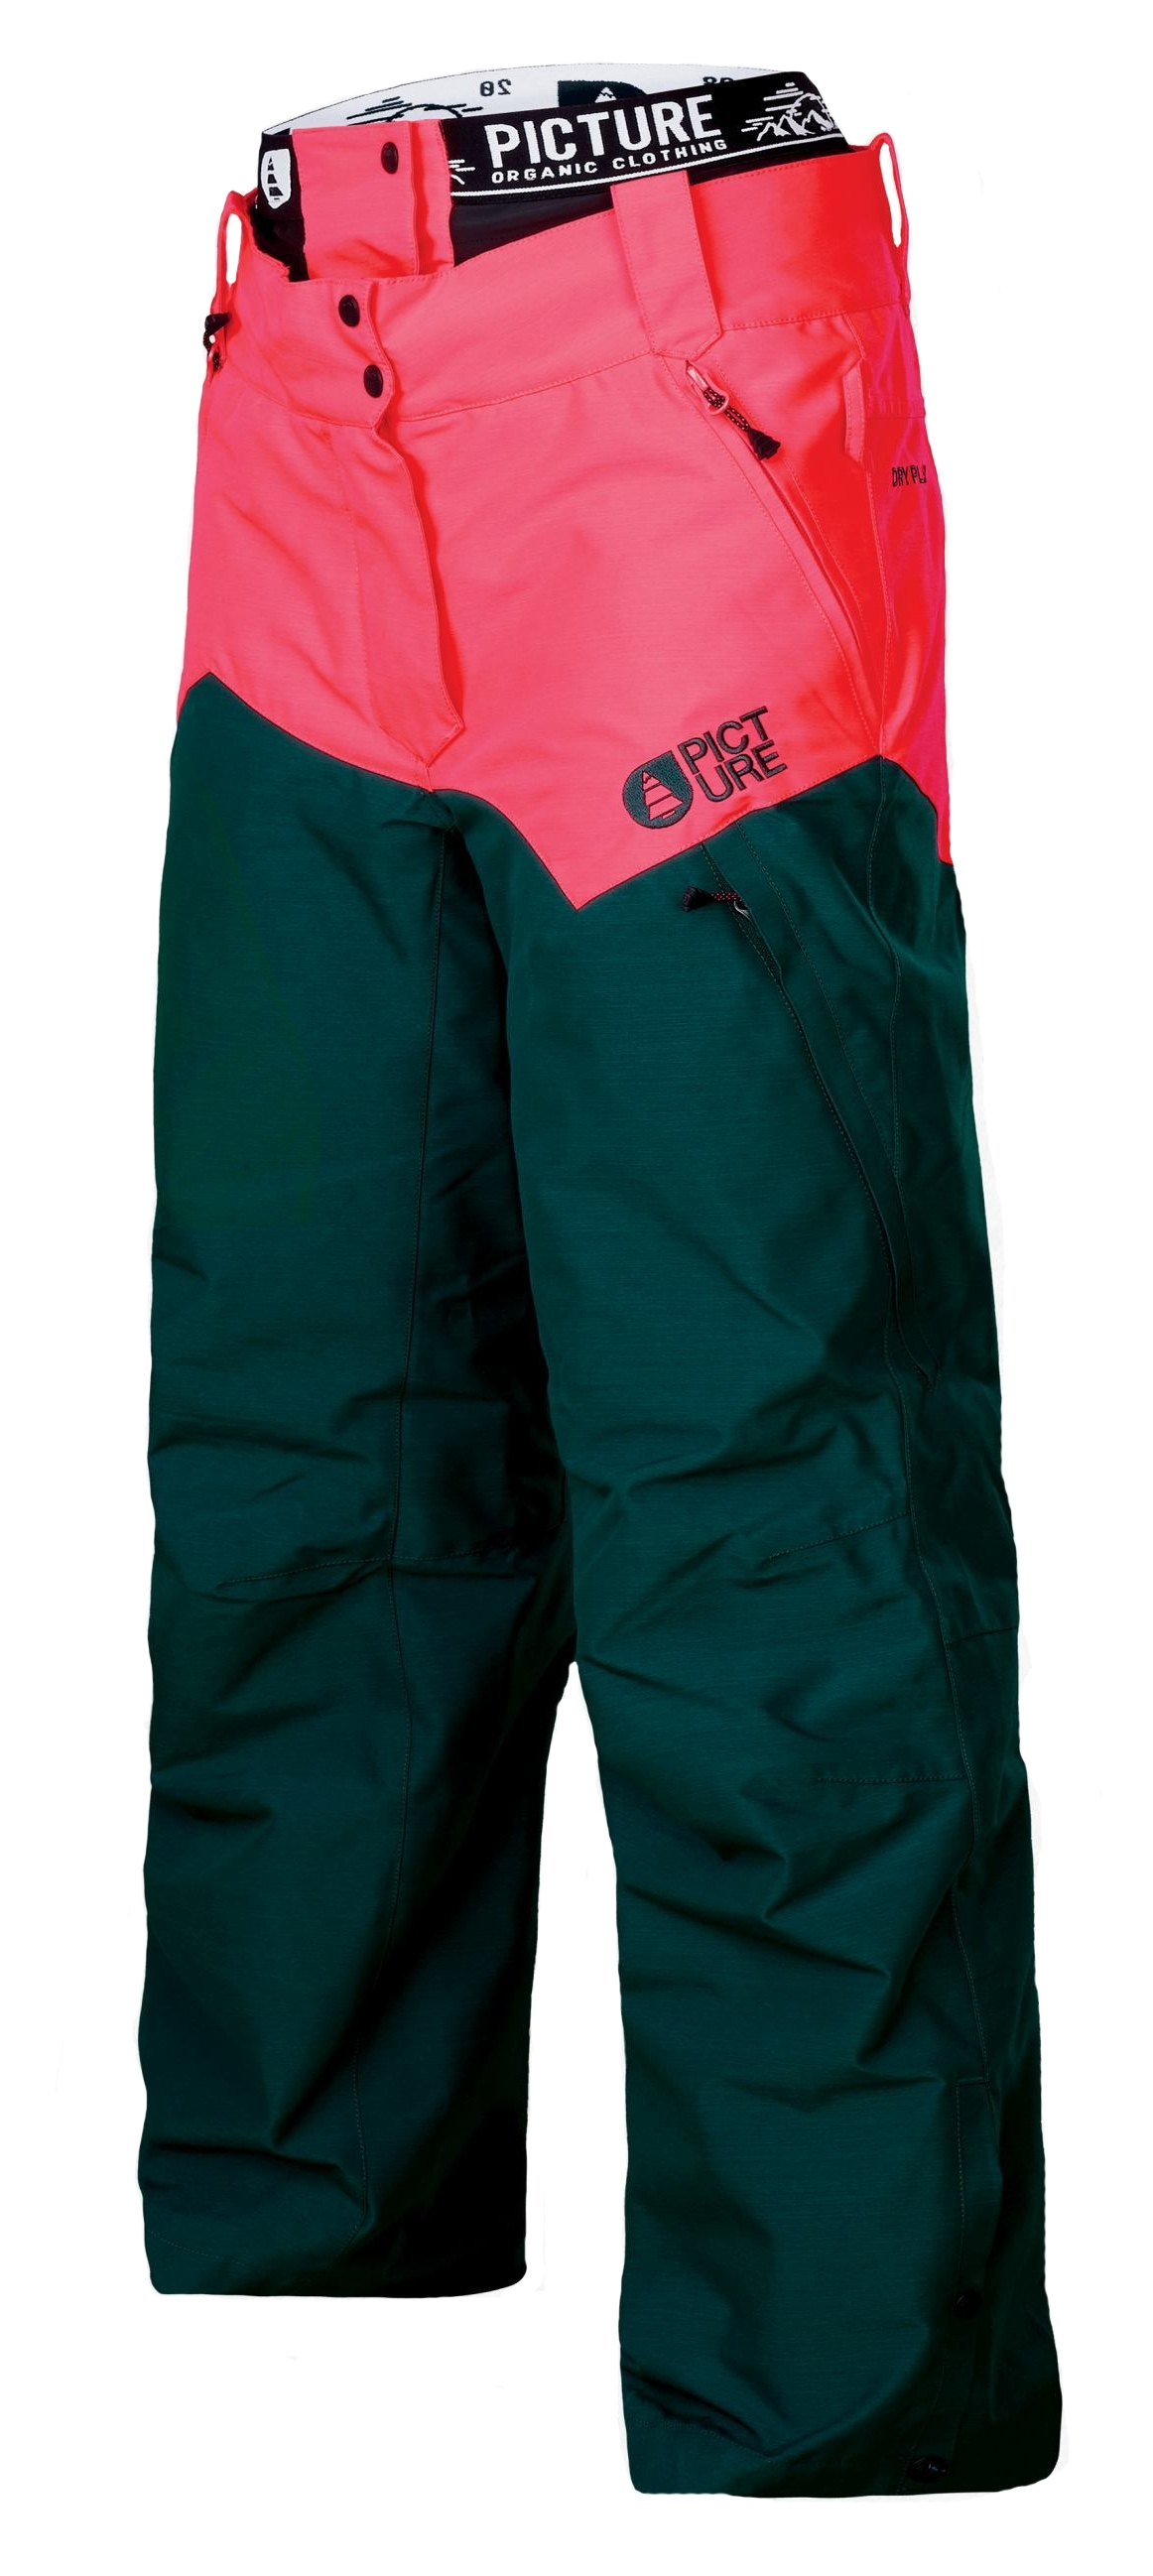 4c2a5c75d89 pantalon-de-ski-picture-organic-week-end-pant-emerald.jpg